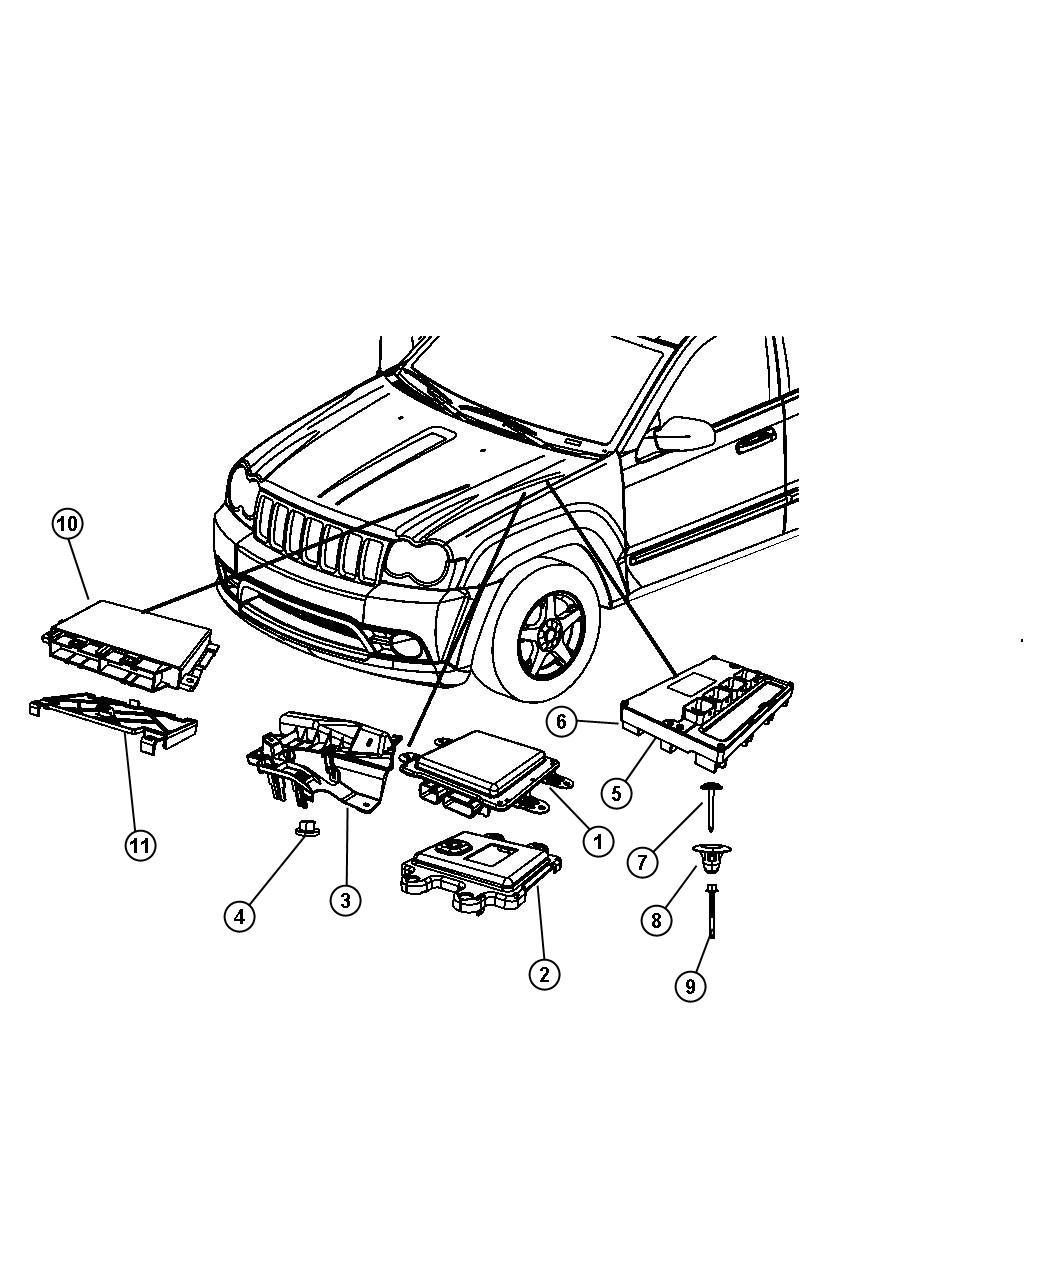 05150311ad - jeep module. powertrain control. generic ... 2010 jeep wrangler drivetrain diagram 2010 jeep wrangler wiring schematic